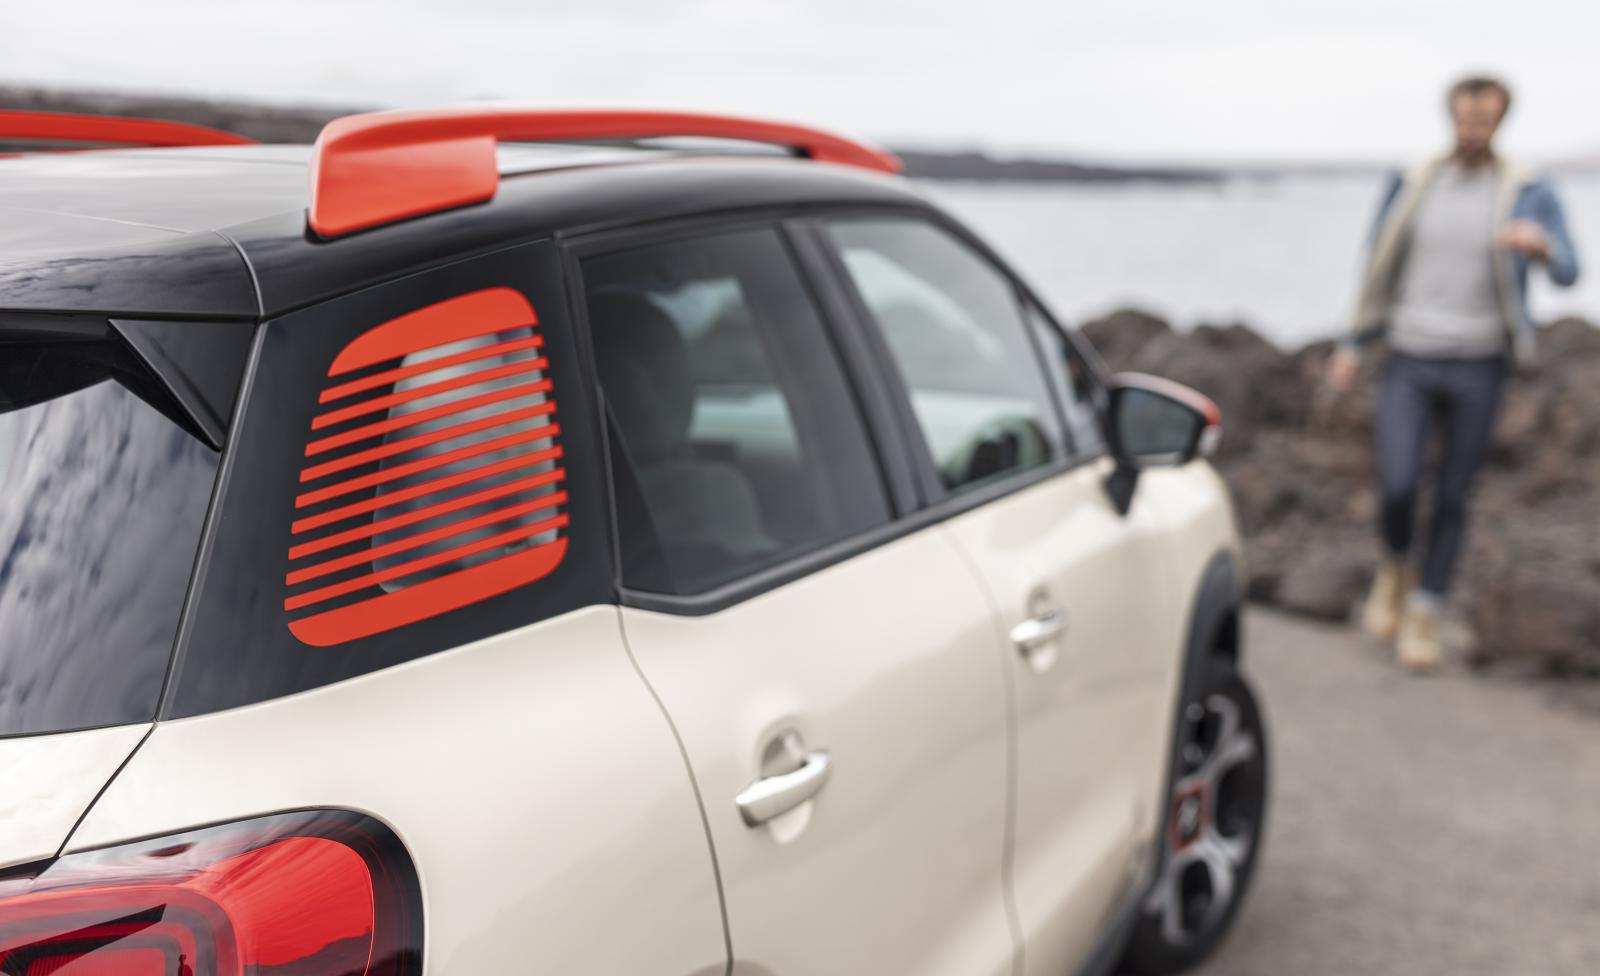 SUV Compact C3 Aircross - lifestyle